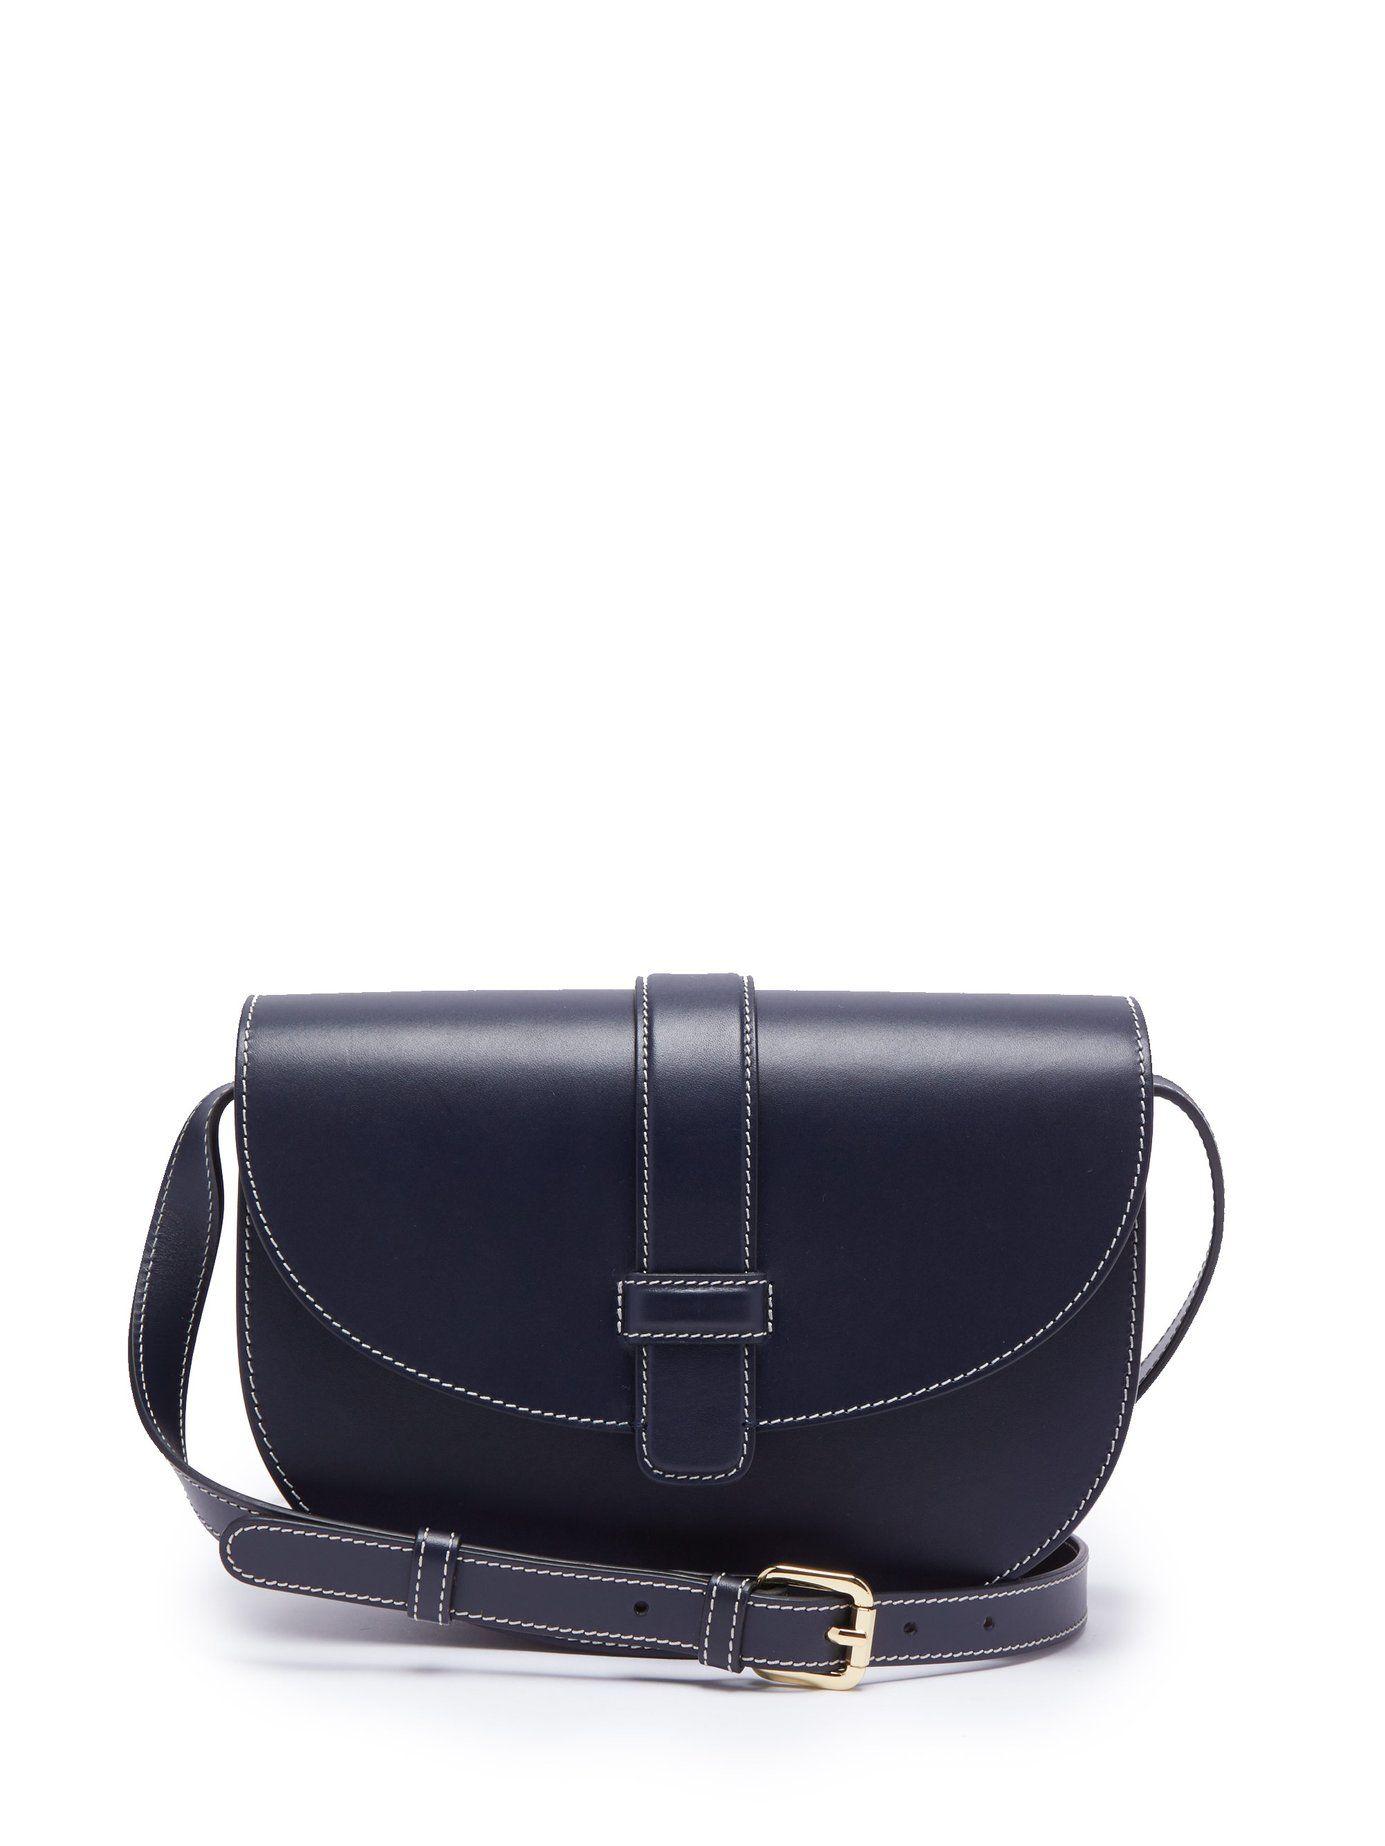 1ea02b621b Eloise leather cross-body bag